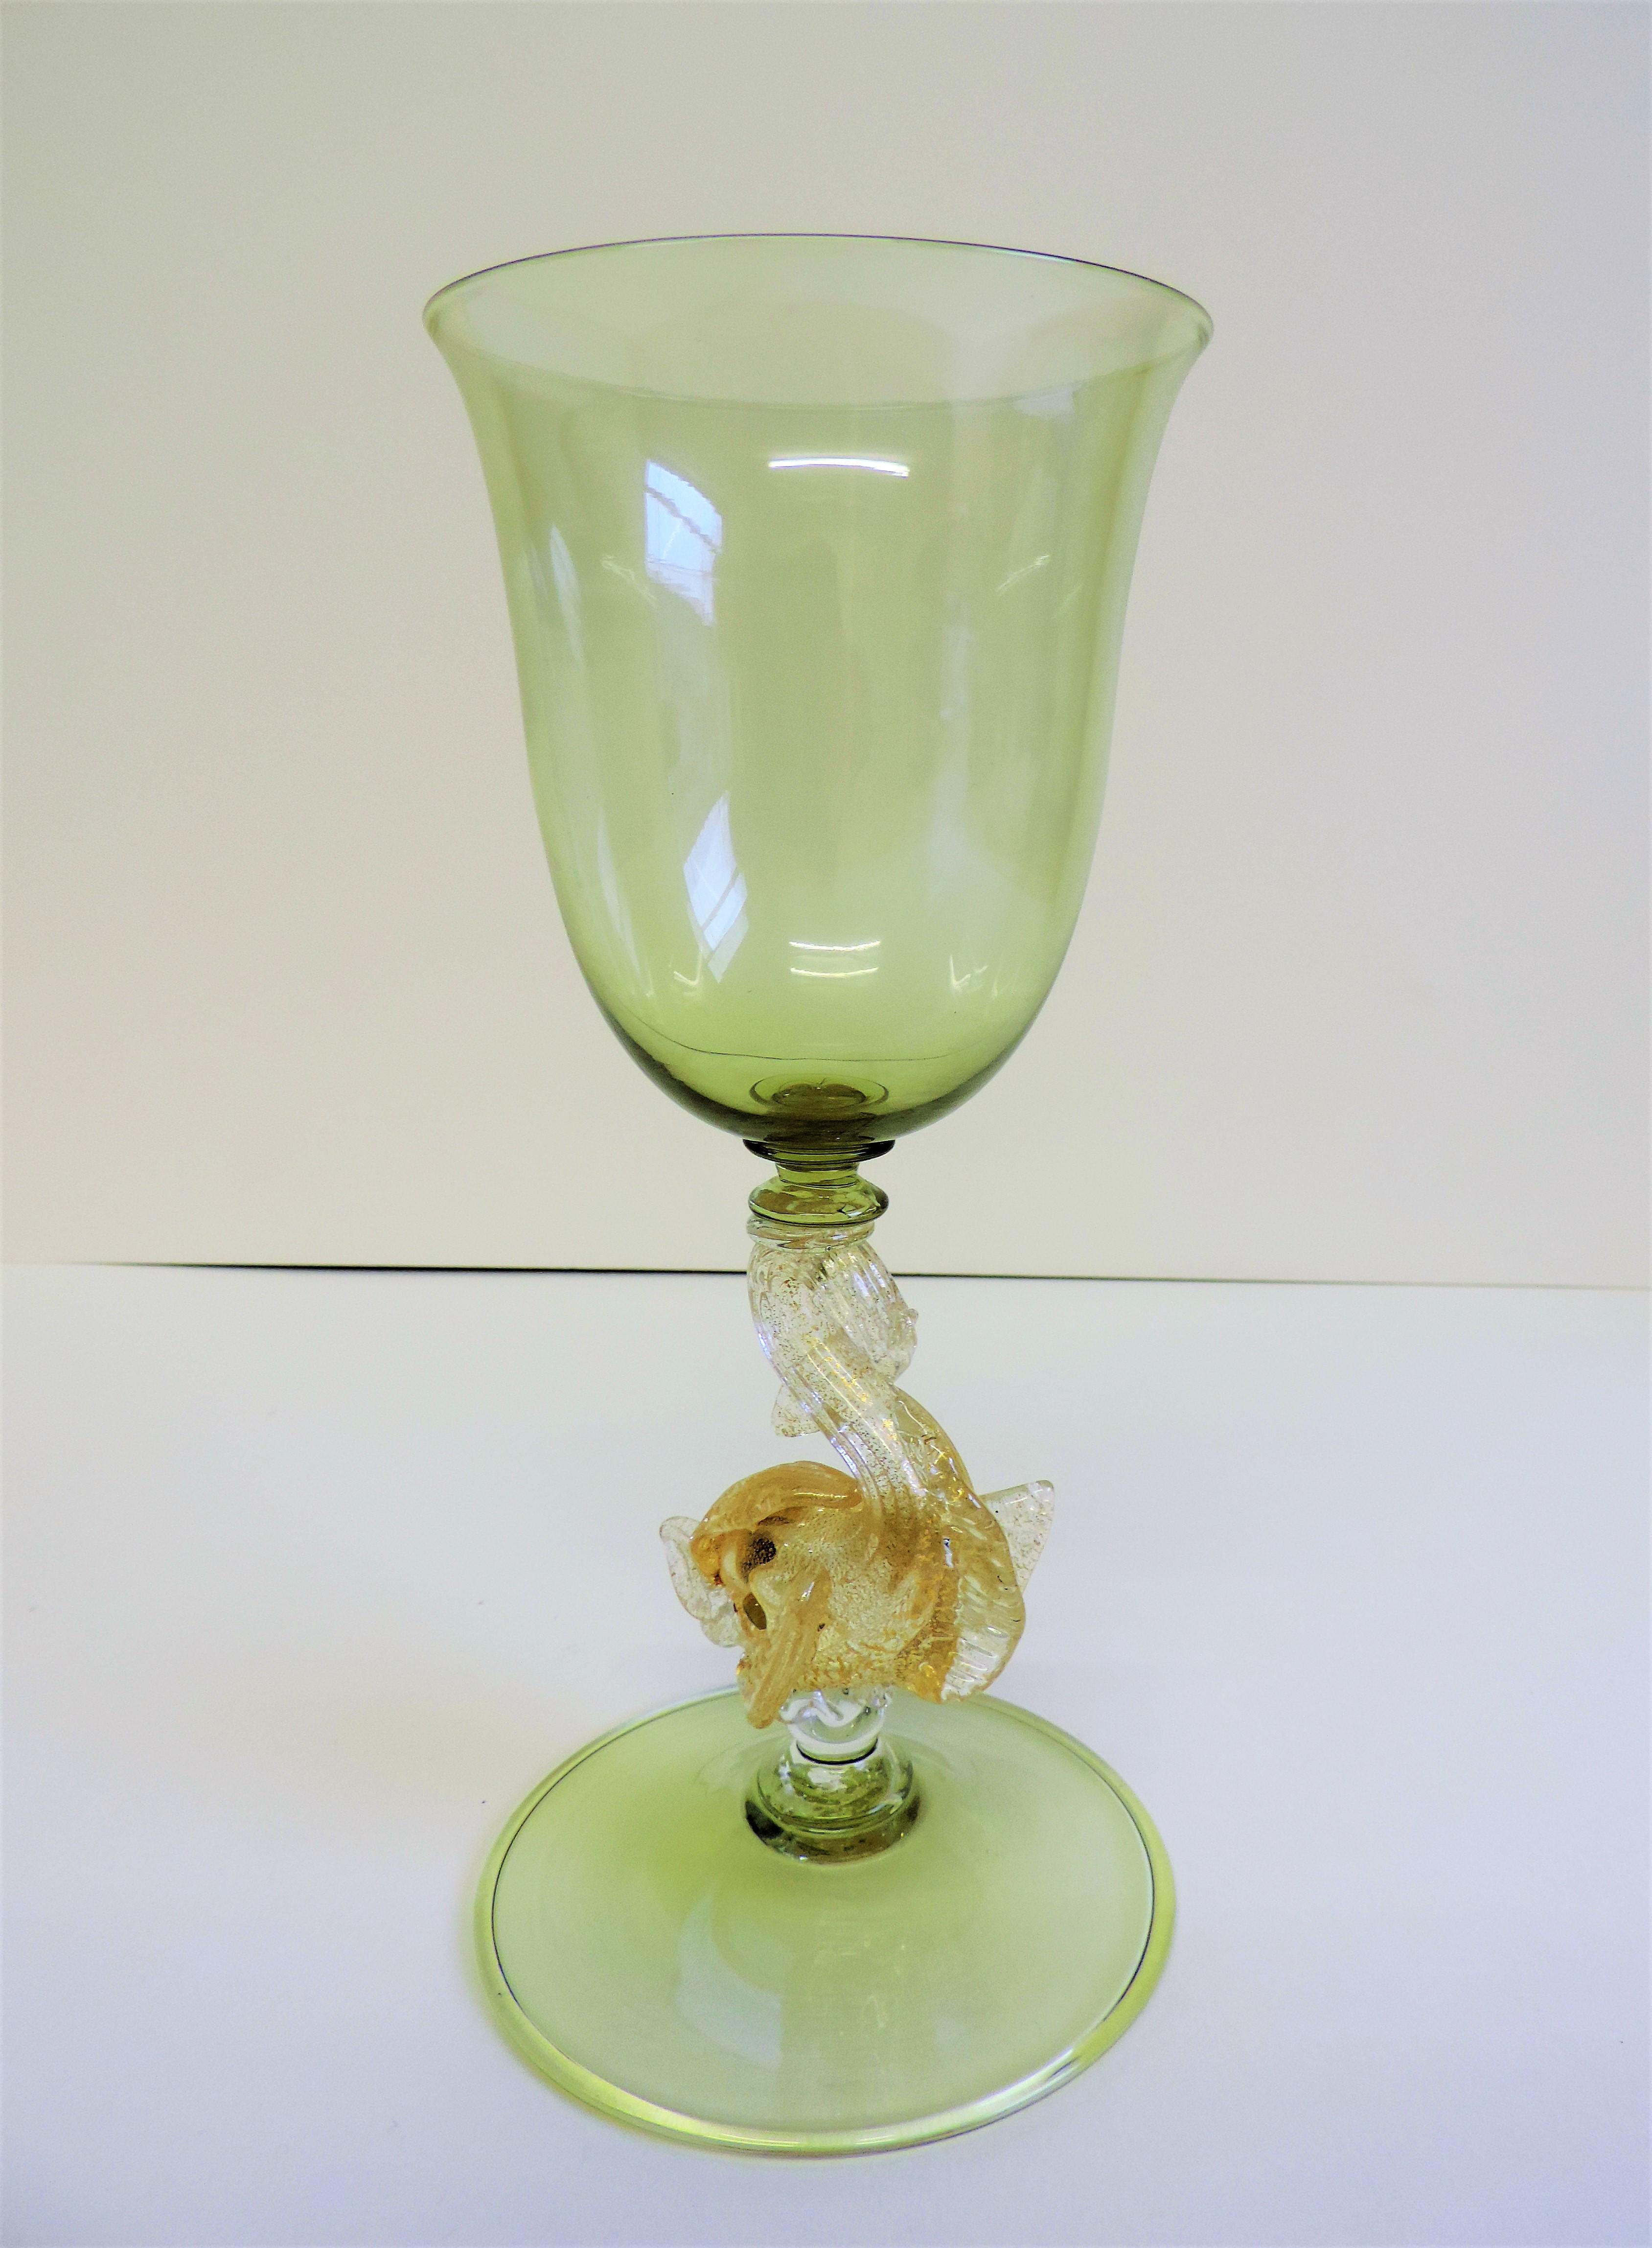 Vintage Murano Salviati Dolphin Wine/Champagne Goblet - Image 3 of 5